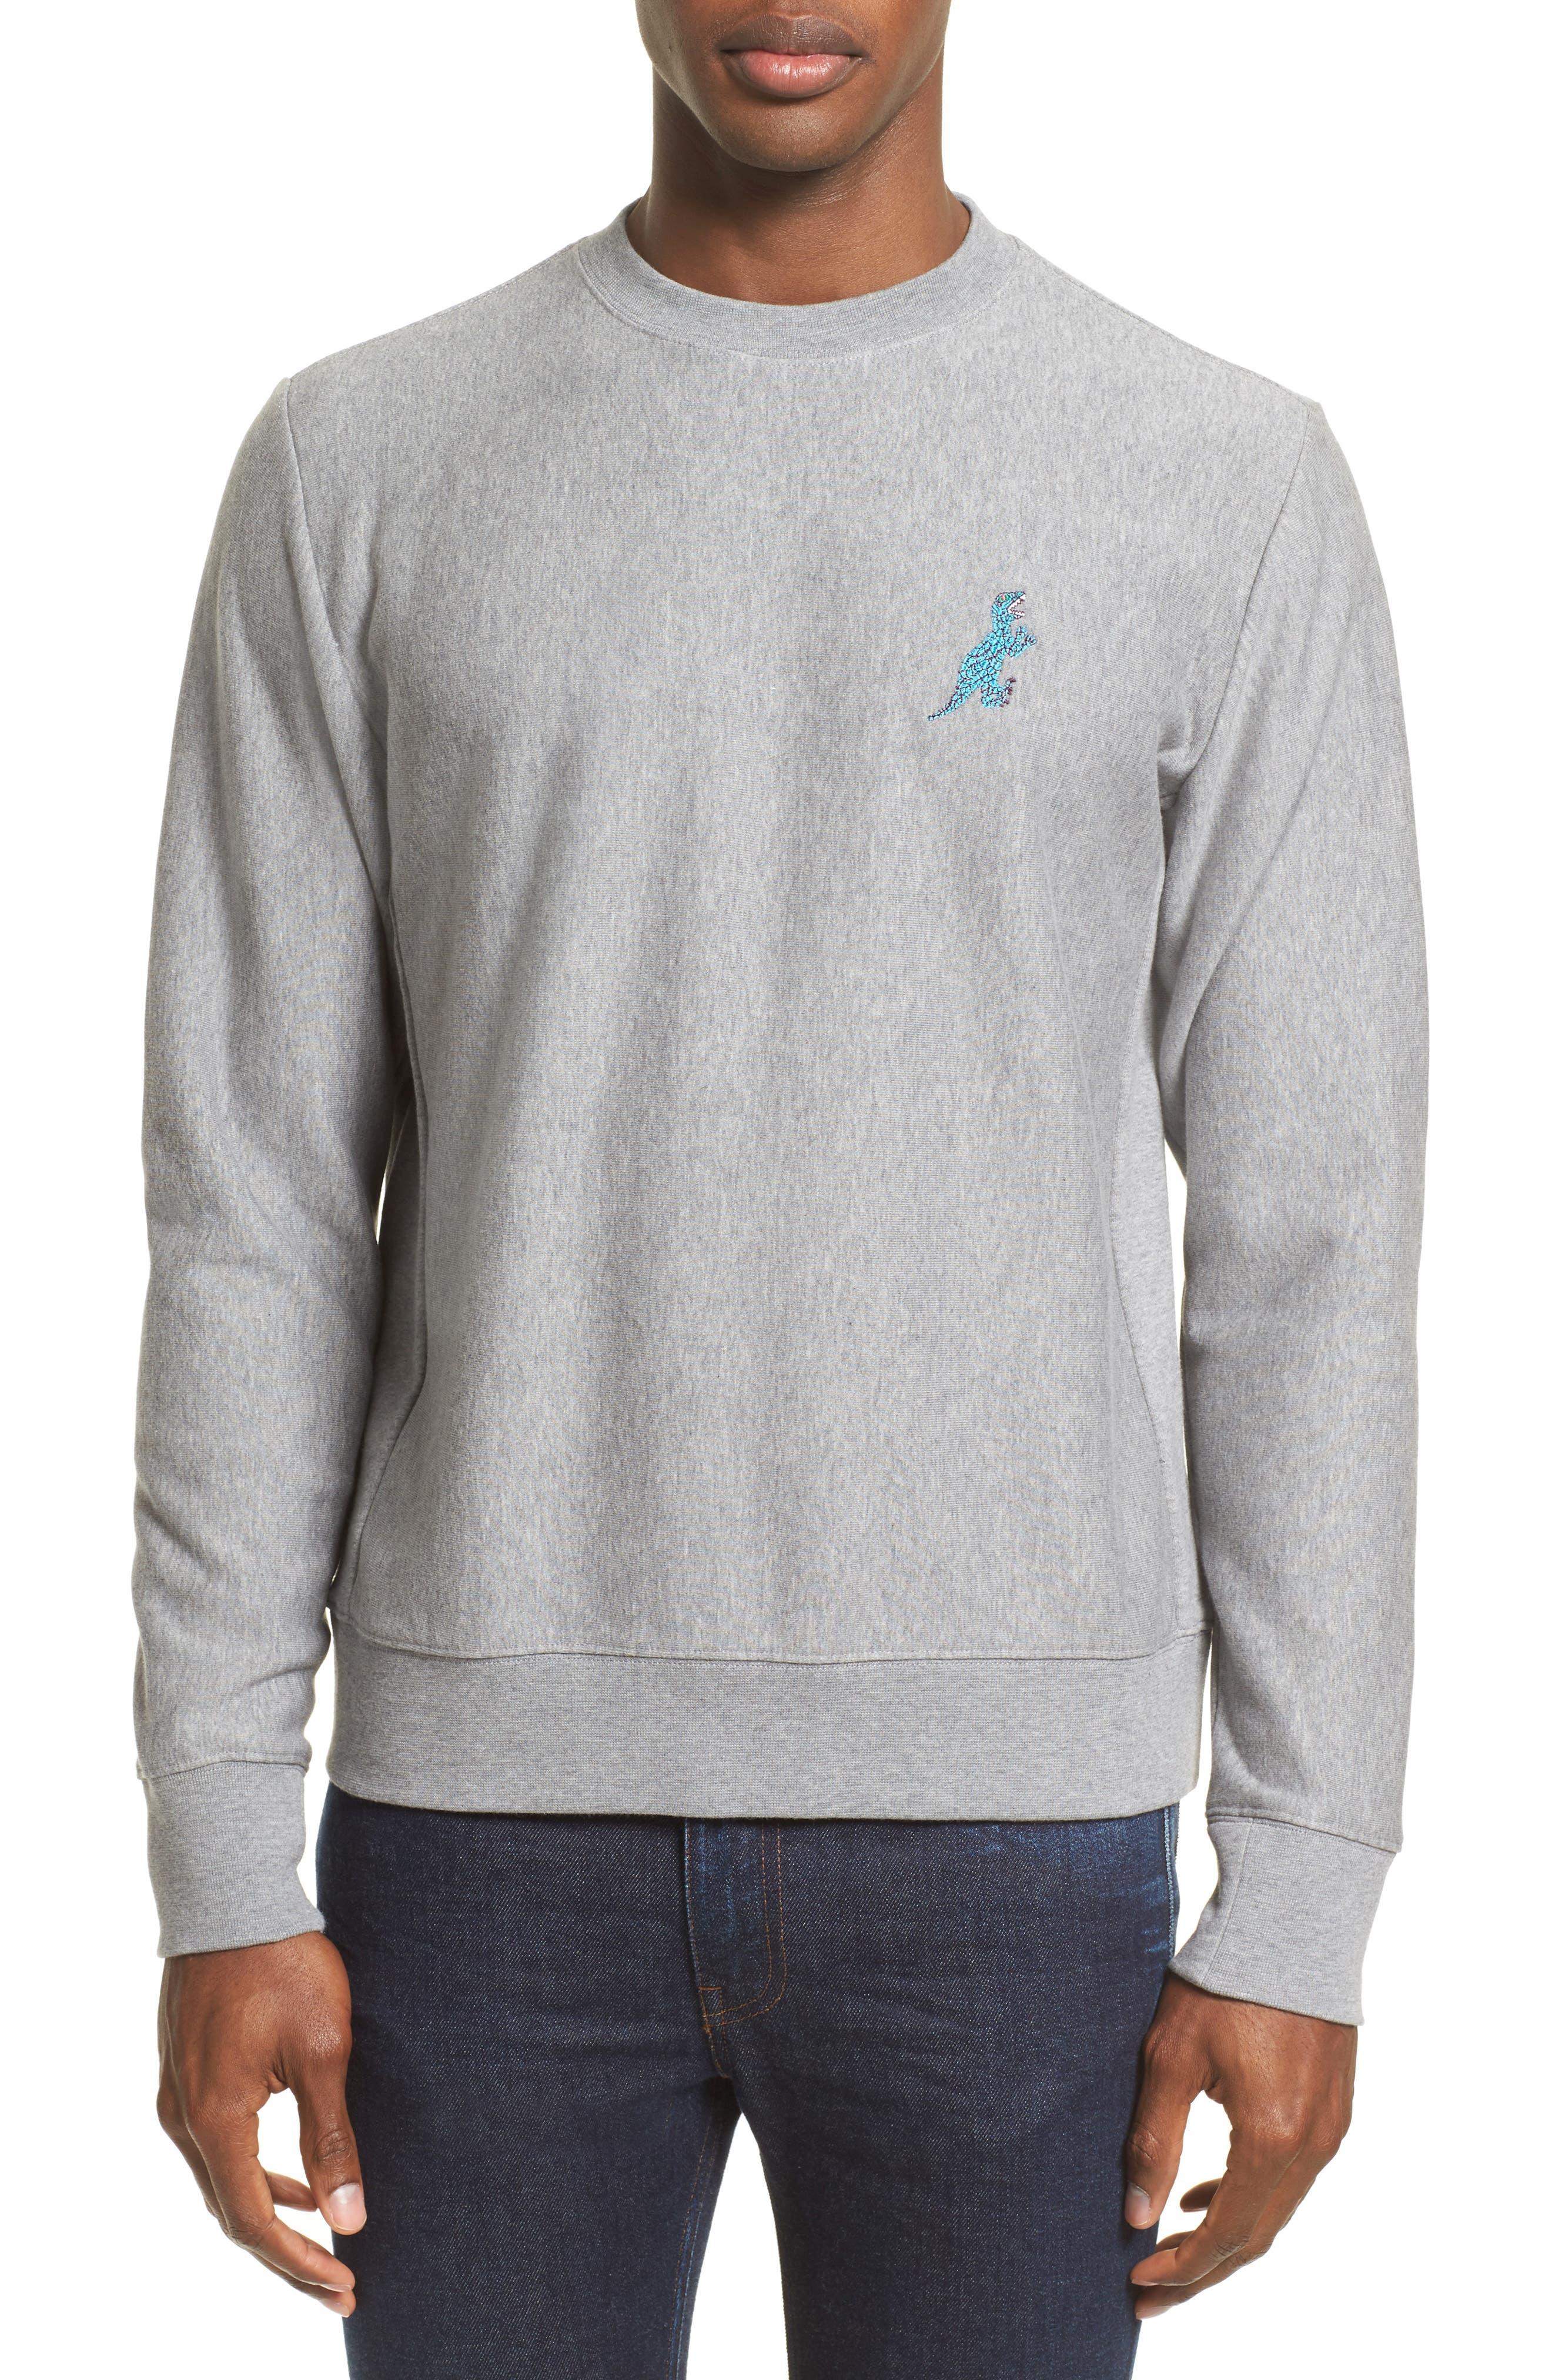 PS Paul Smith Dino Dino Embroidered Sweatshirt